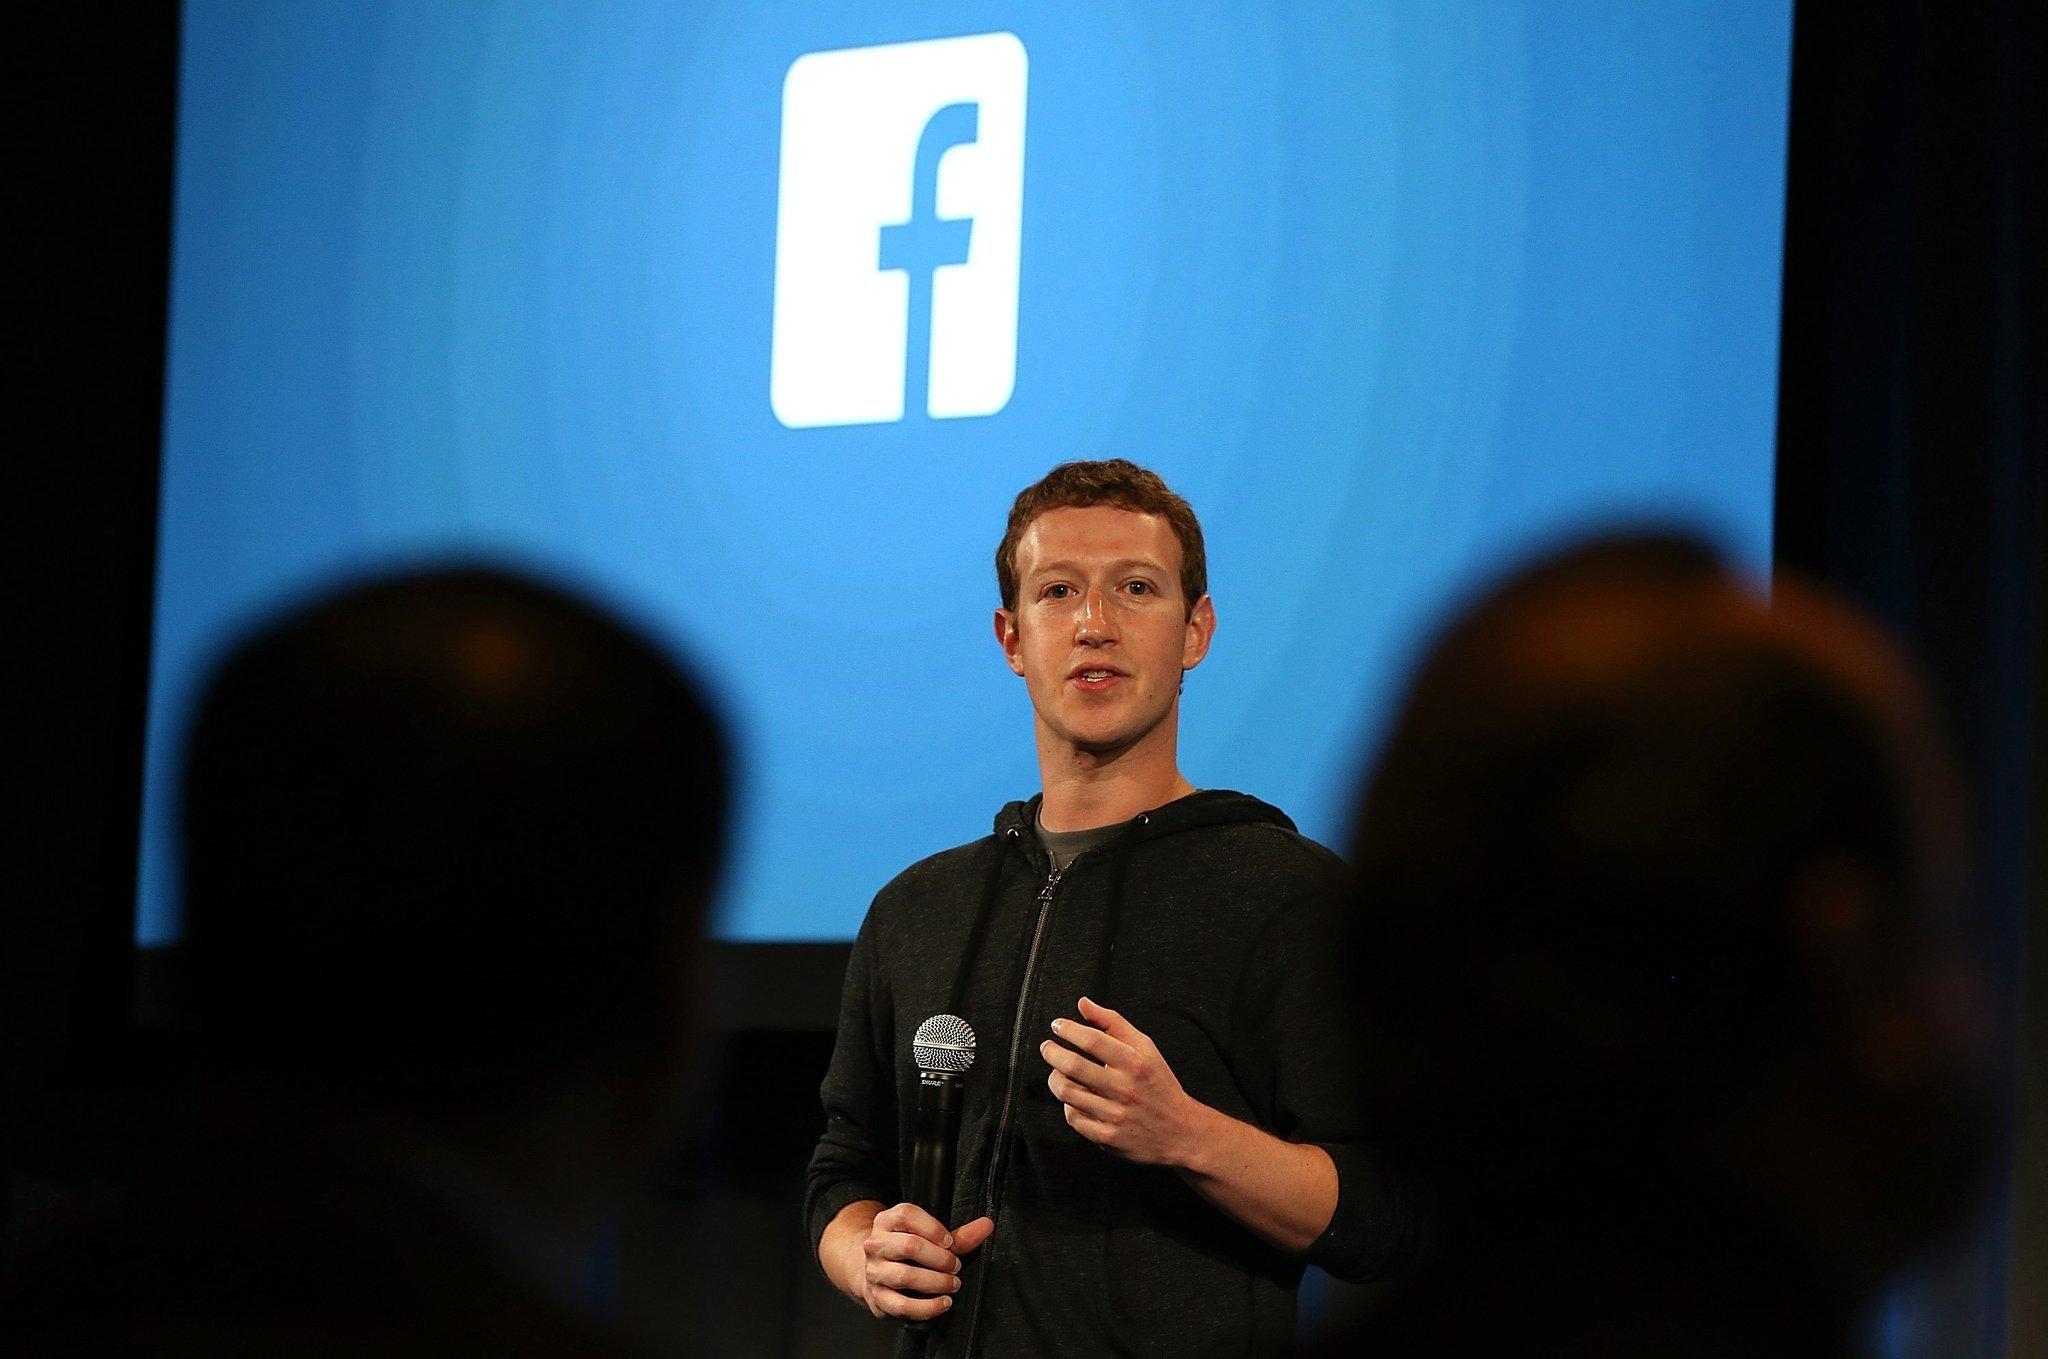 Facebook bet on mobile ads